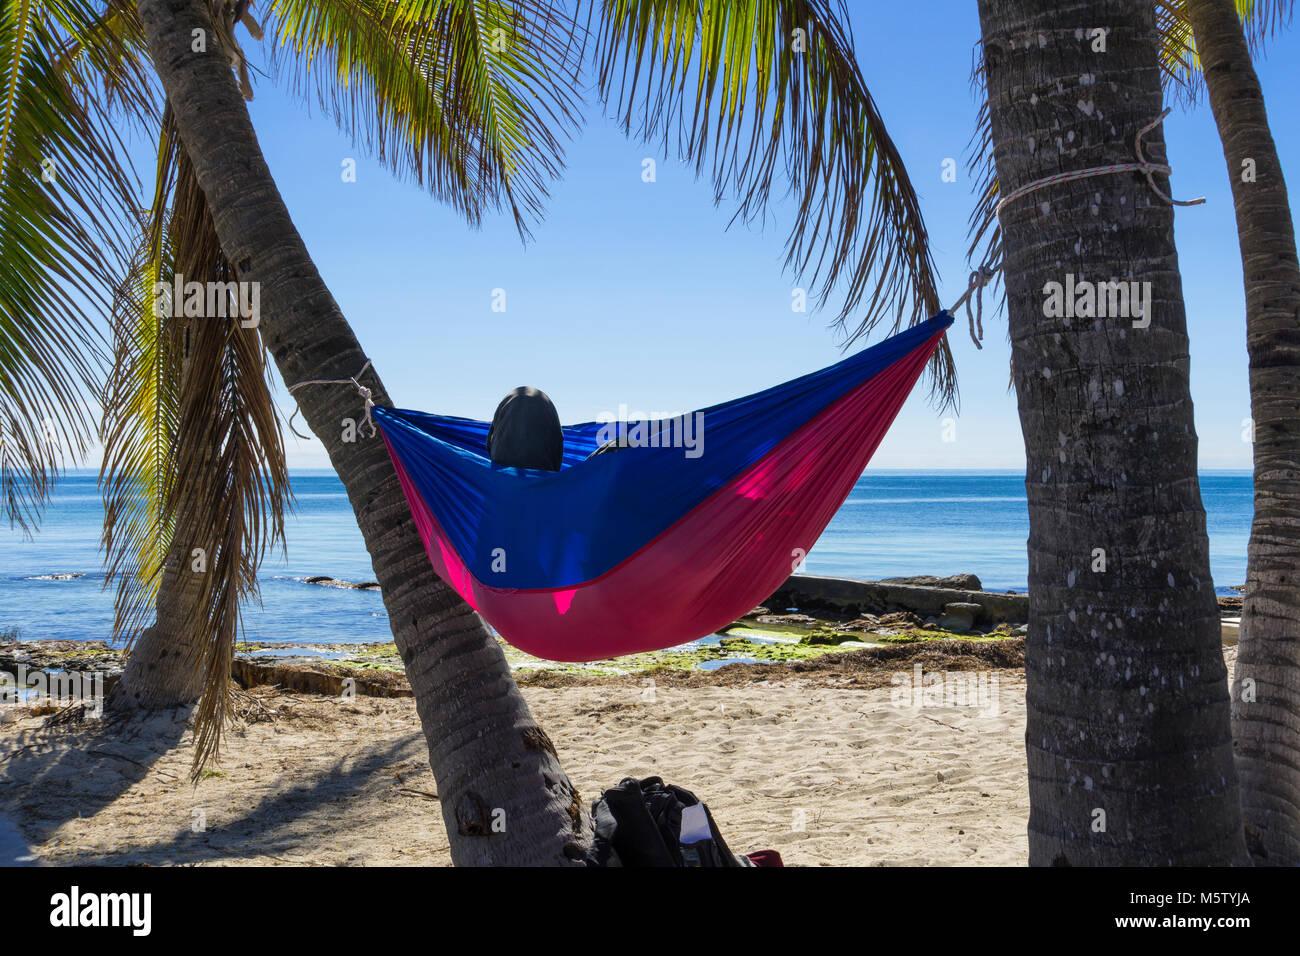 usa florida colorful hammock hanging between palm tree trunks at white sand beach usa florida colorful hammock hanging between palm tree trunks at      rh   alamy